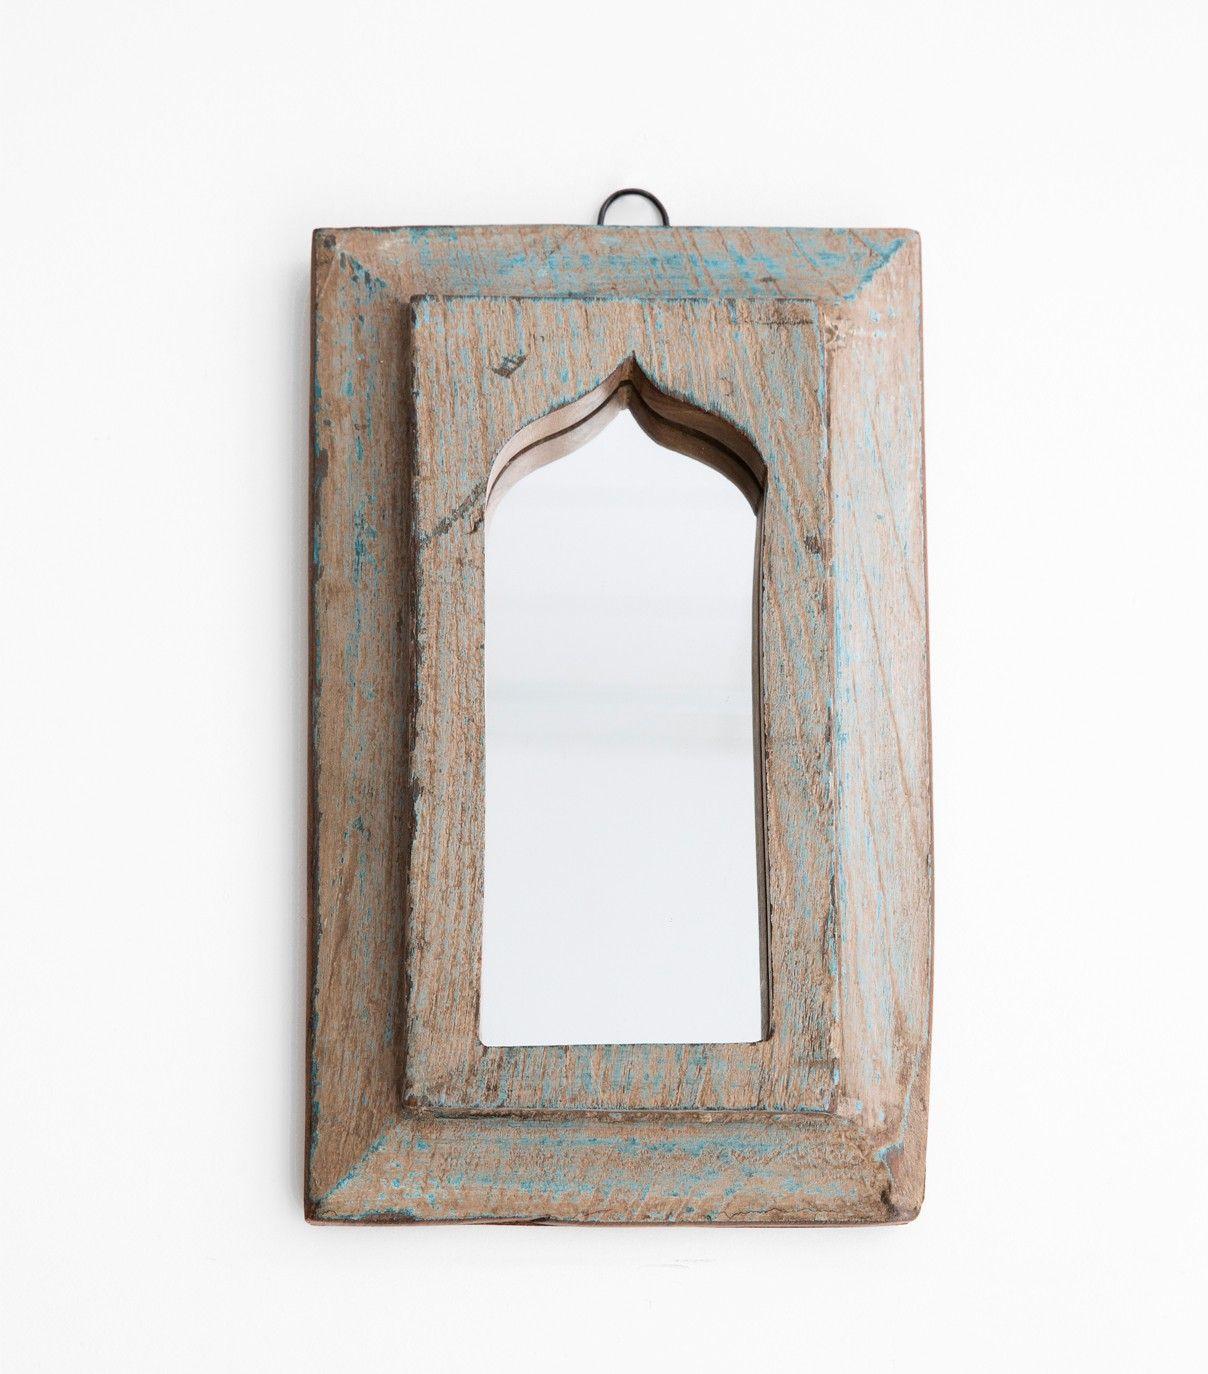 Miroir indien en bois